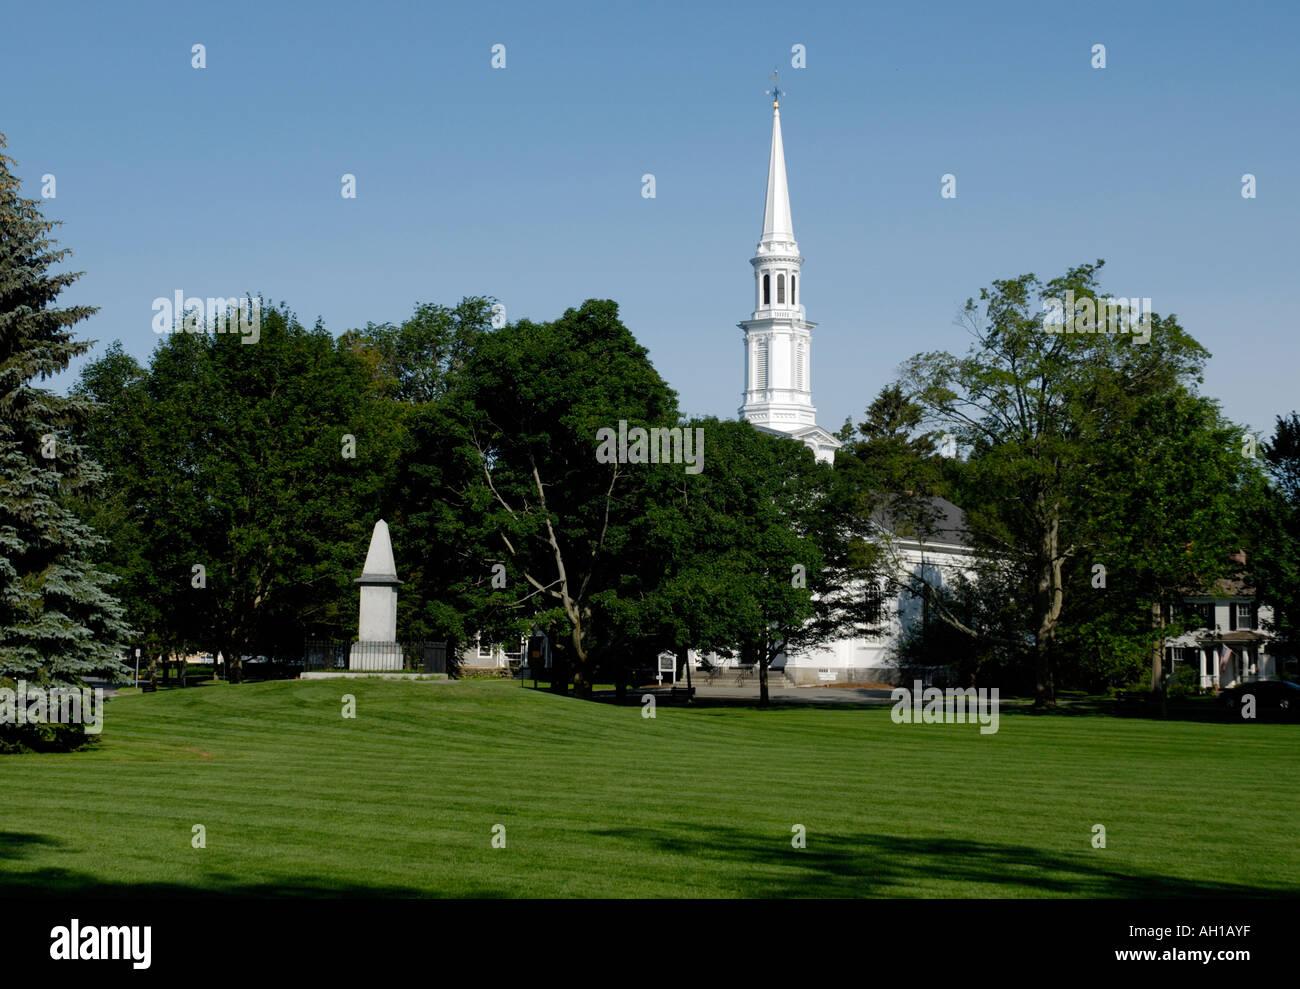 Lexington Battle Green, site of the firt skirmish of the American Revolution, April 19, 1775 Stock Photo